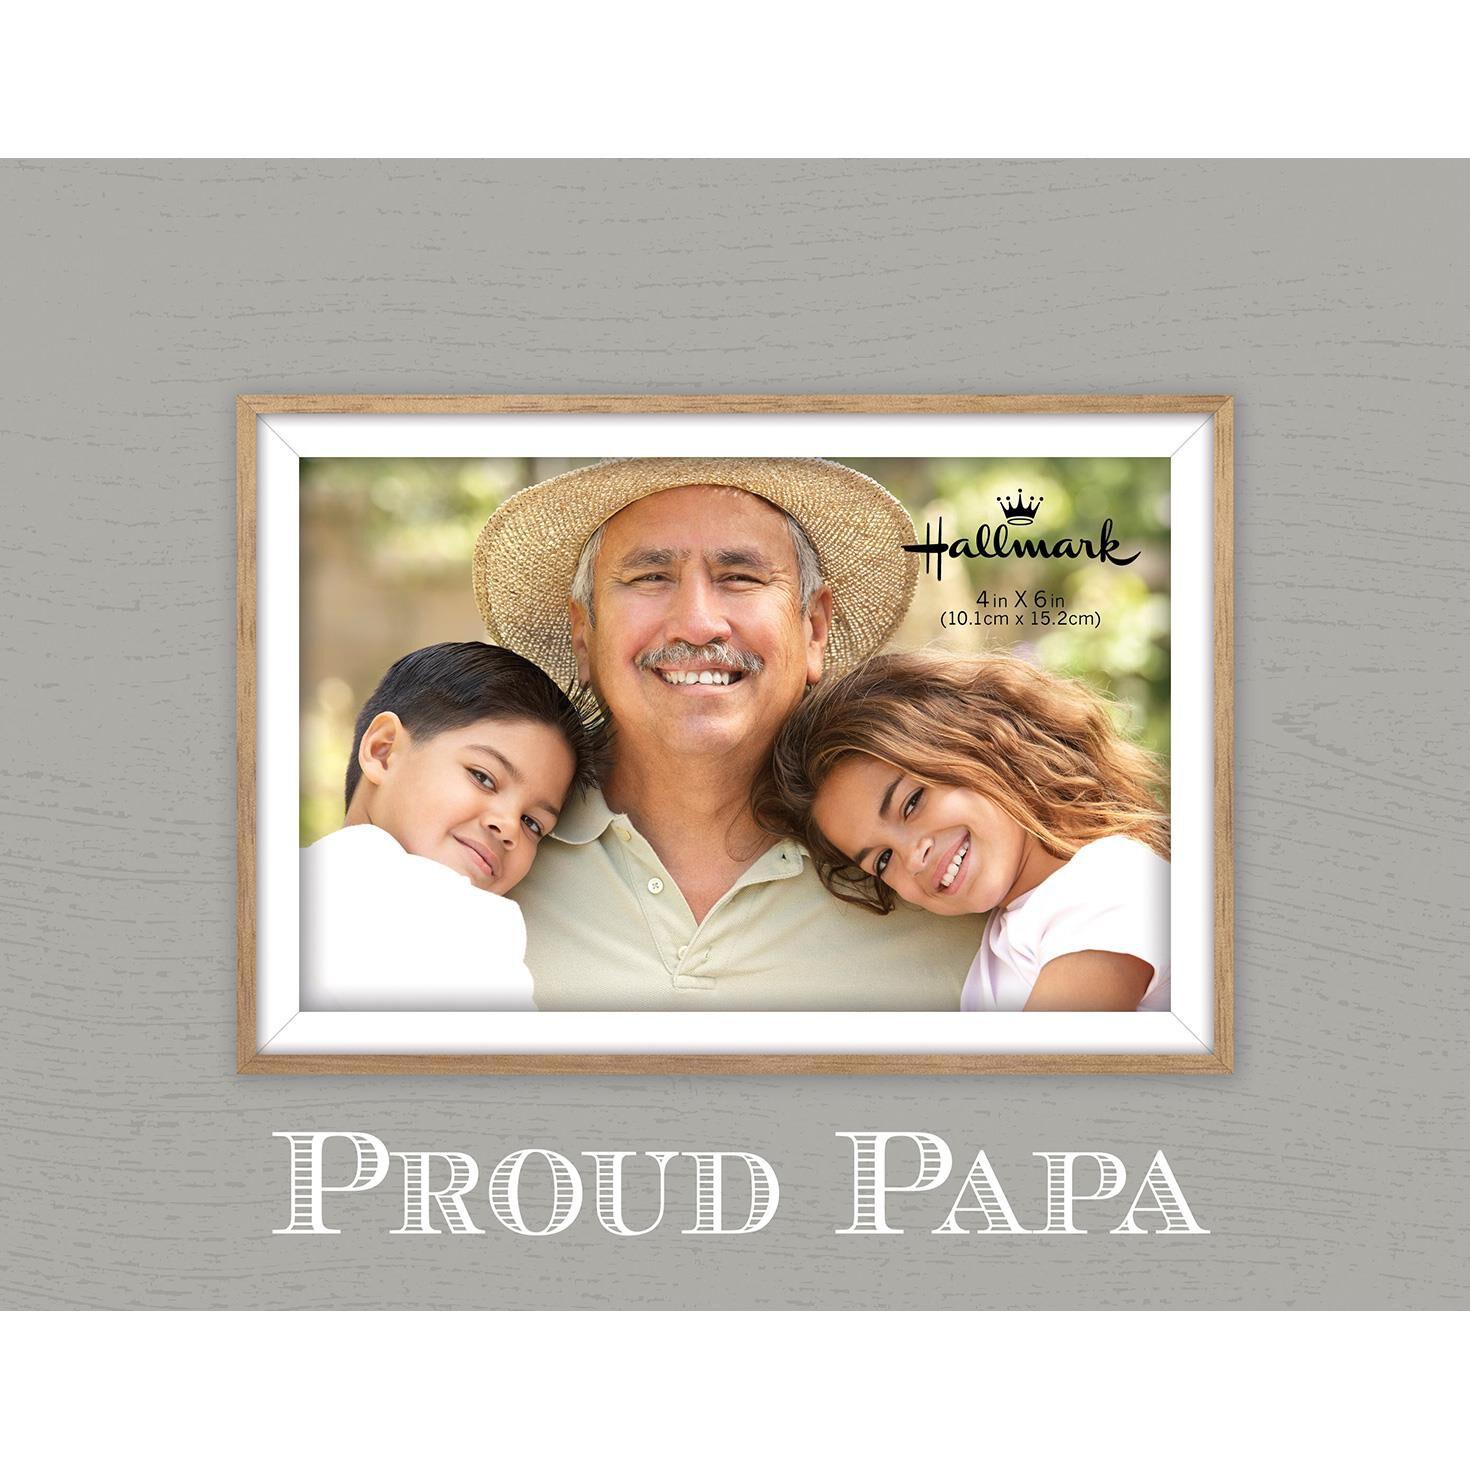 proud papa malden picture frame 4x6